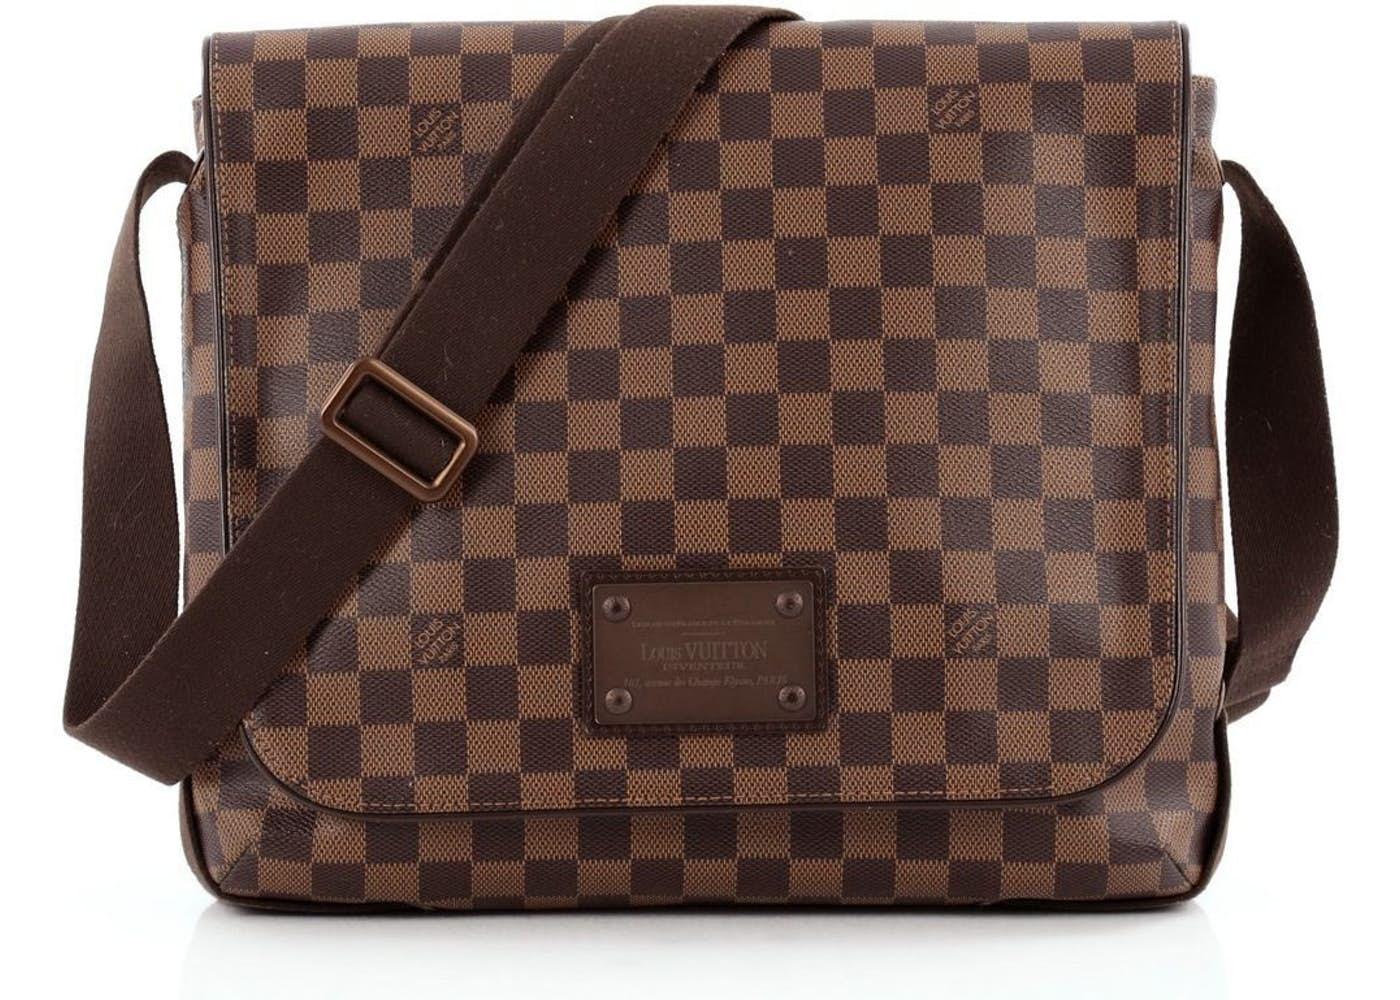 63a00bc3cb6b Louis Vuitton Brooklyn Mm Damier Messenger Bag